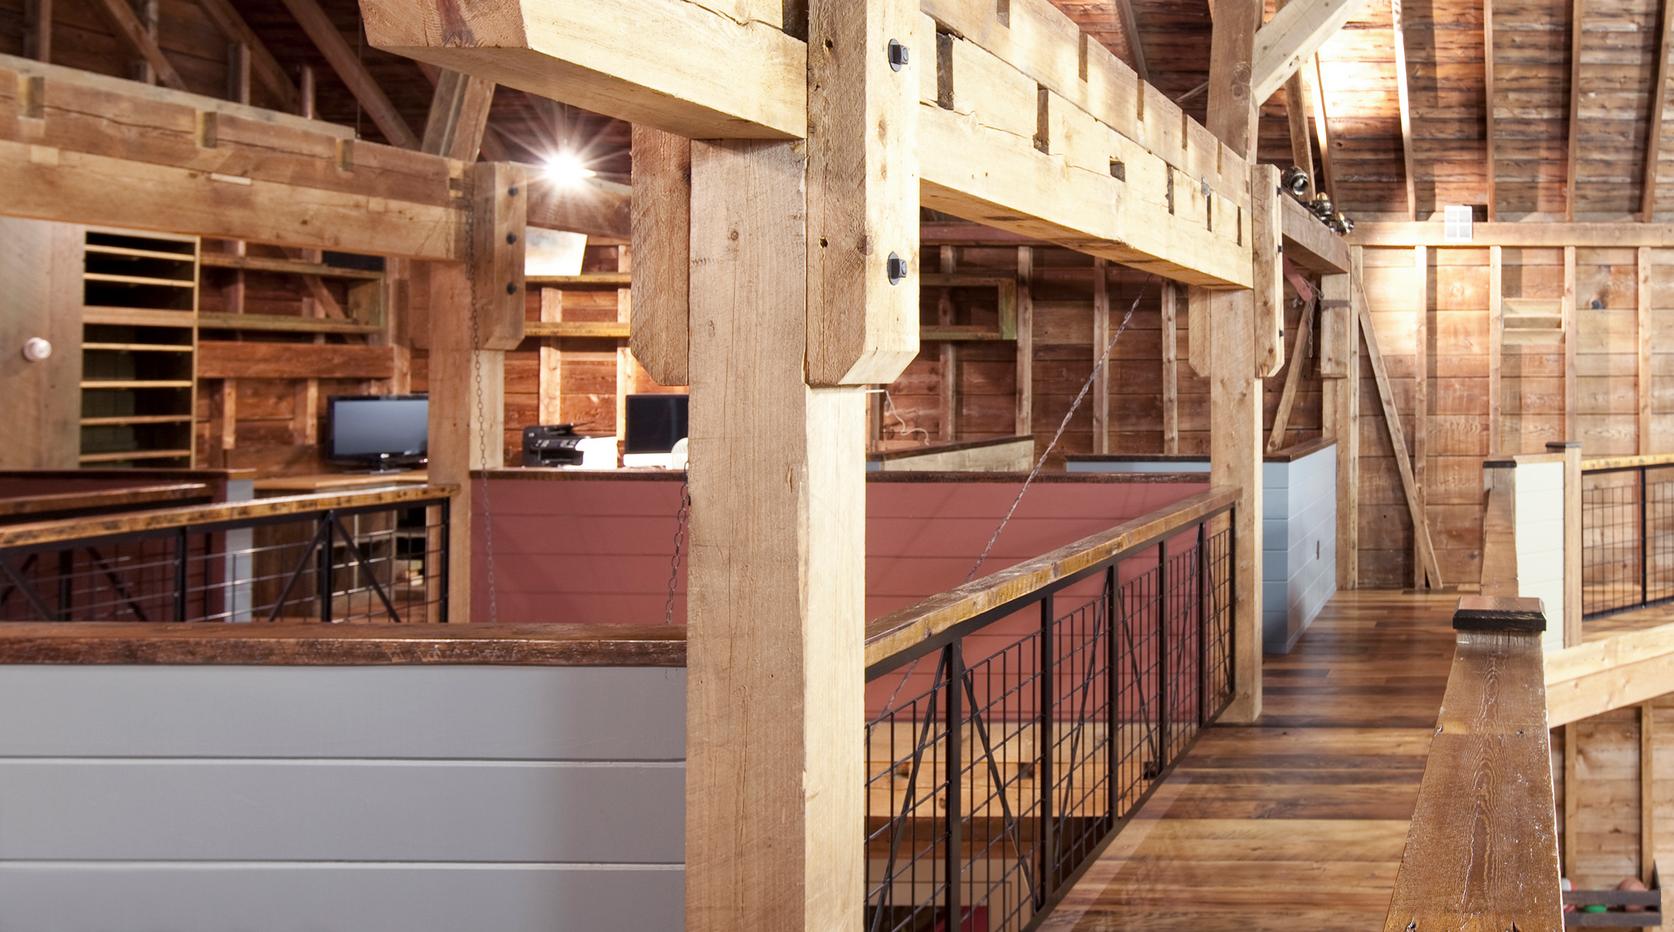 Studio InSitu studioinsitu.com